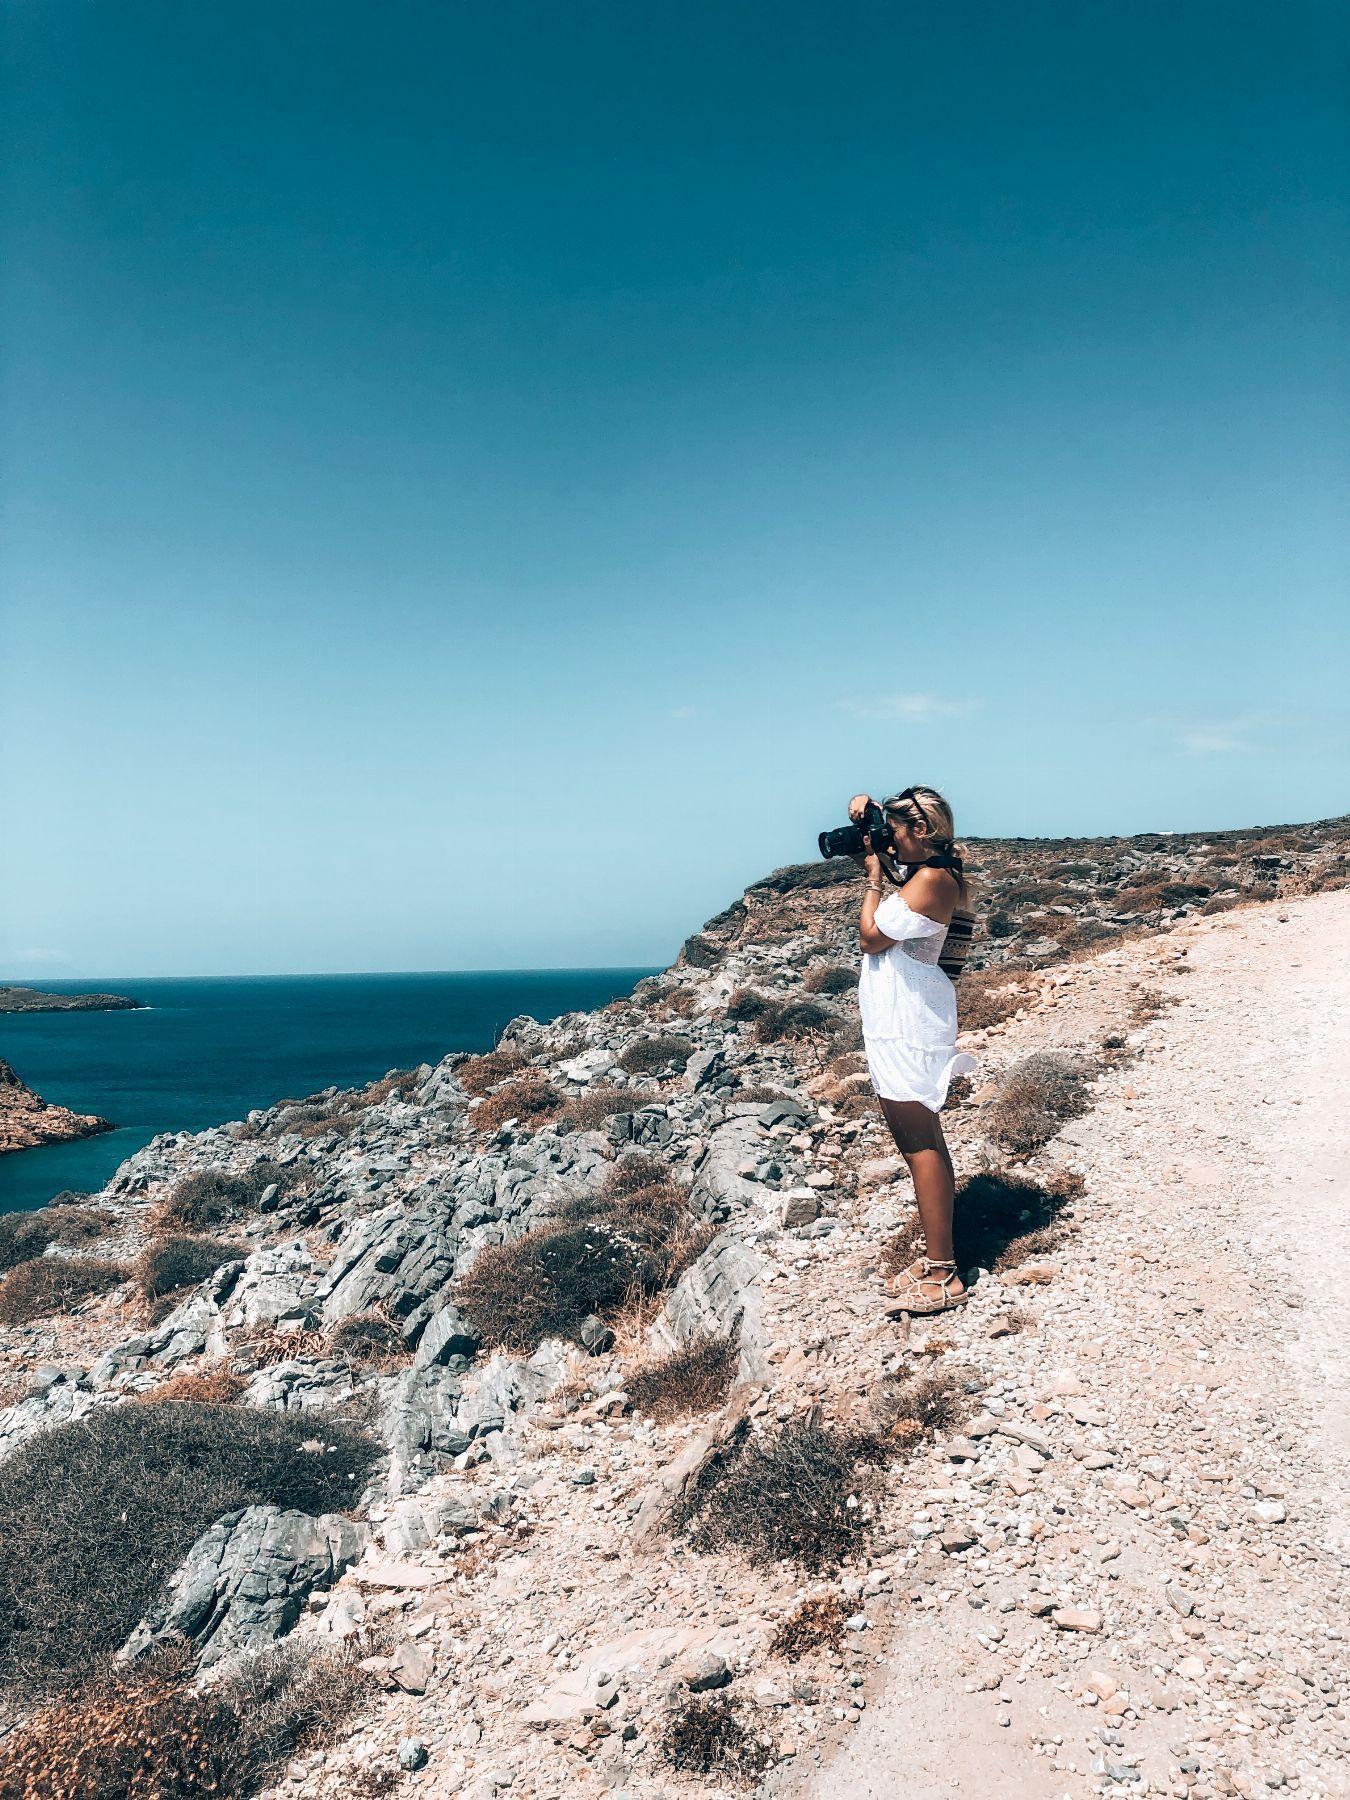 Cheronissos Beach